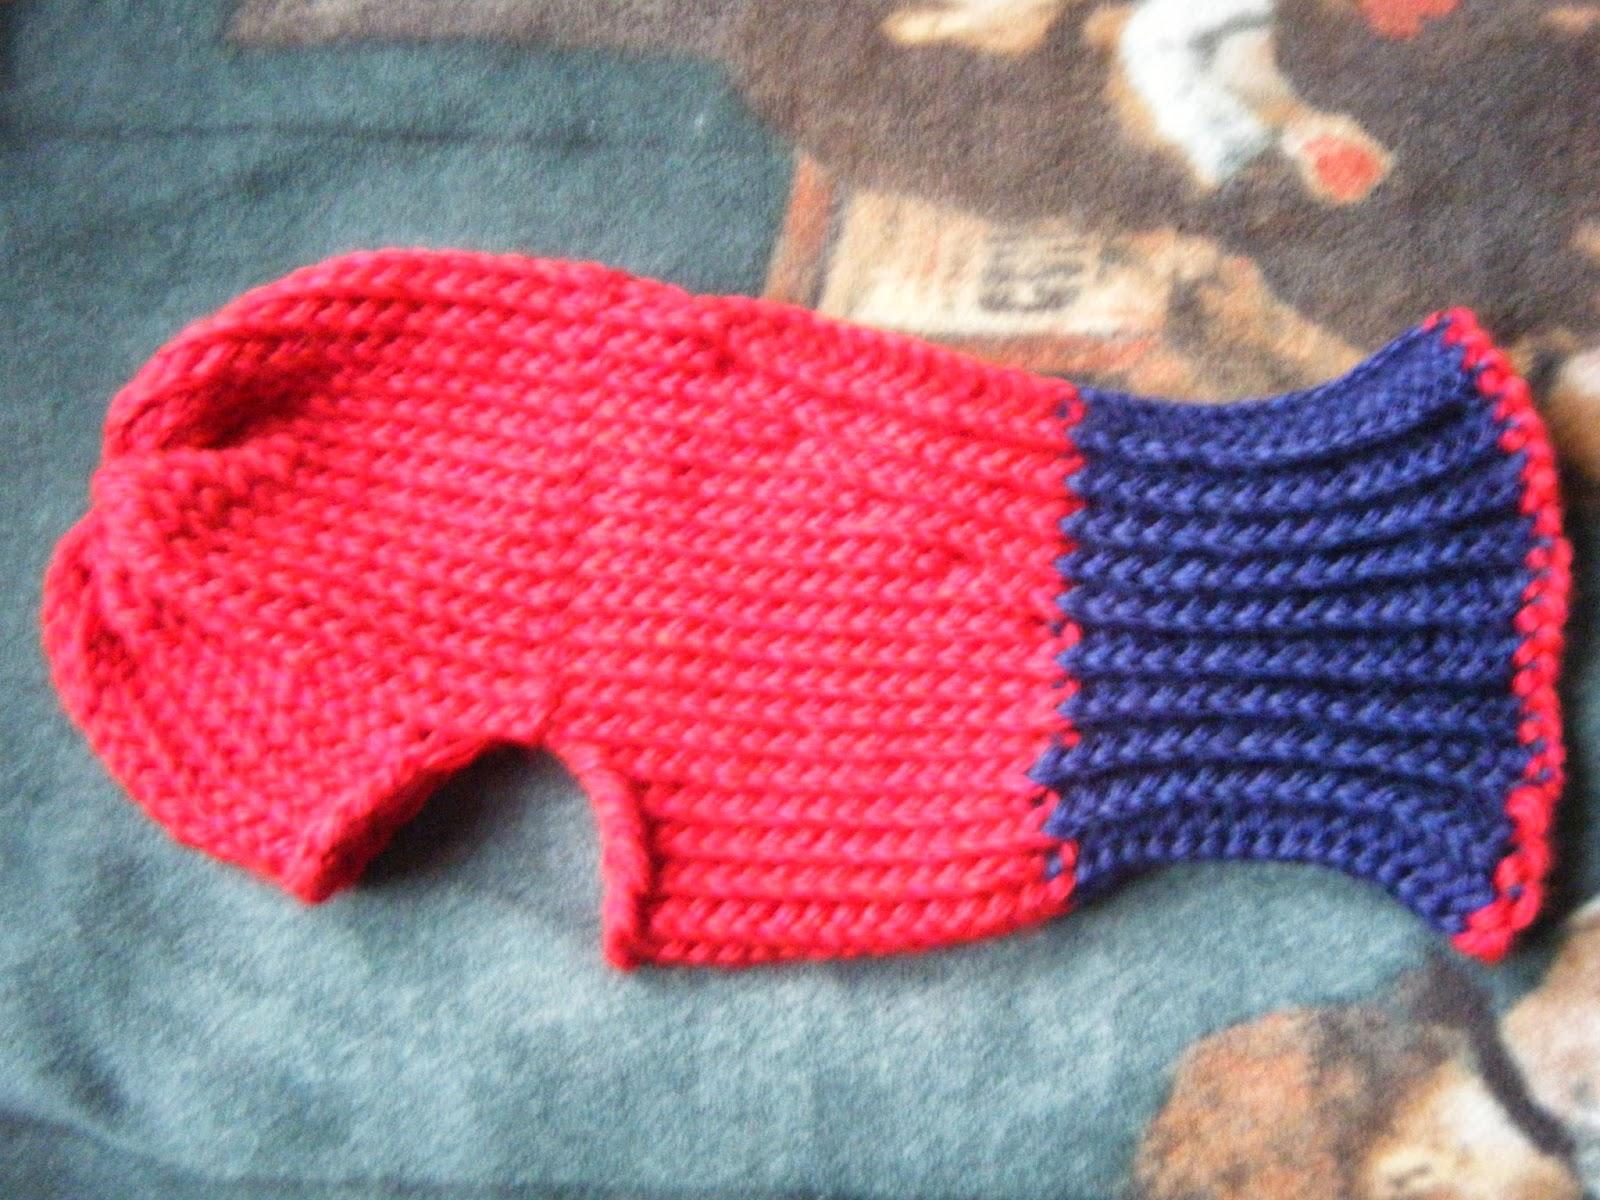 Ski Mask Knitting Pattern : The Loom Muse : Ski Mask